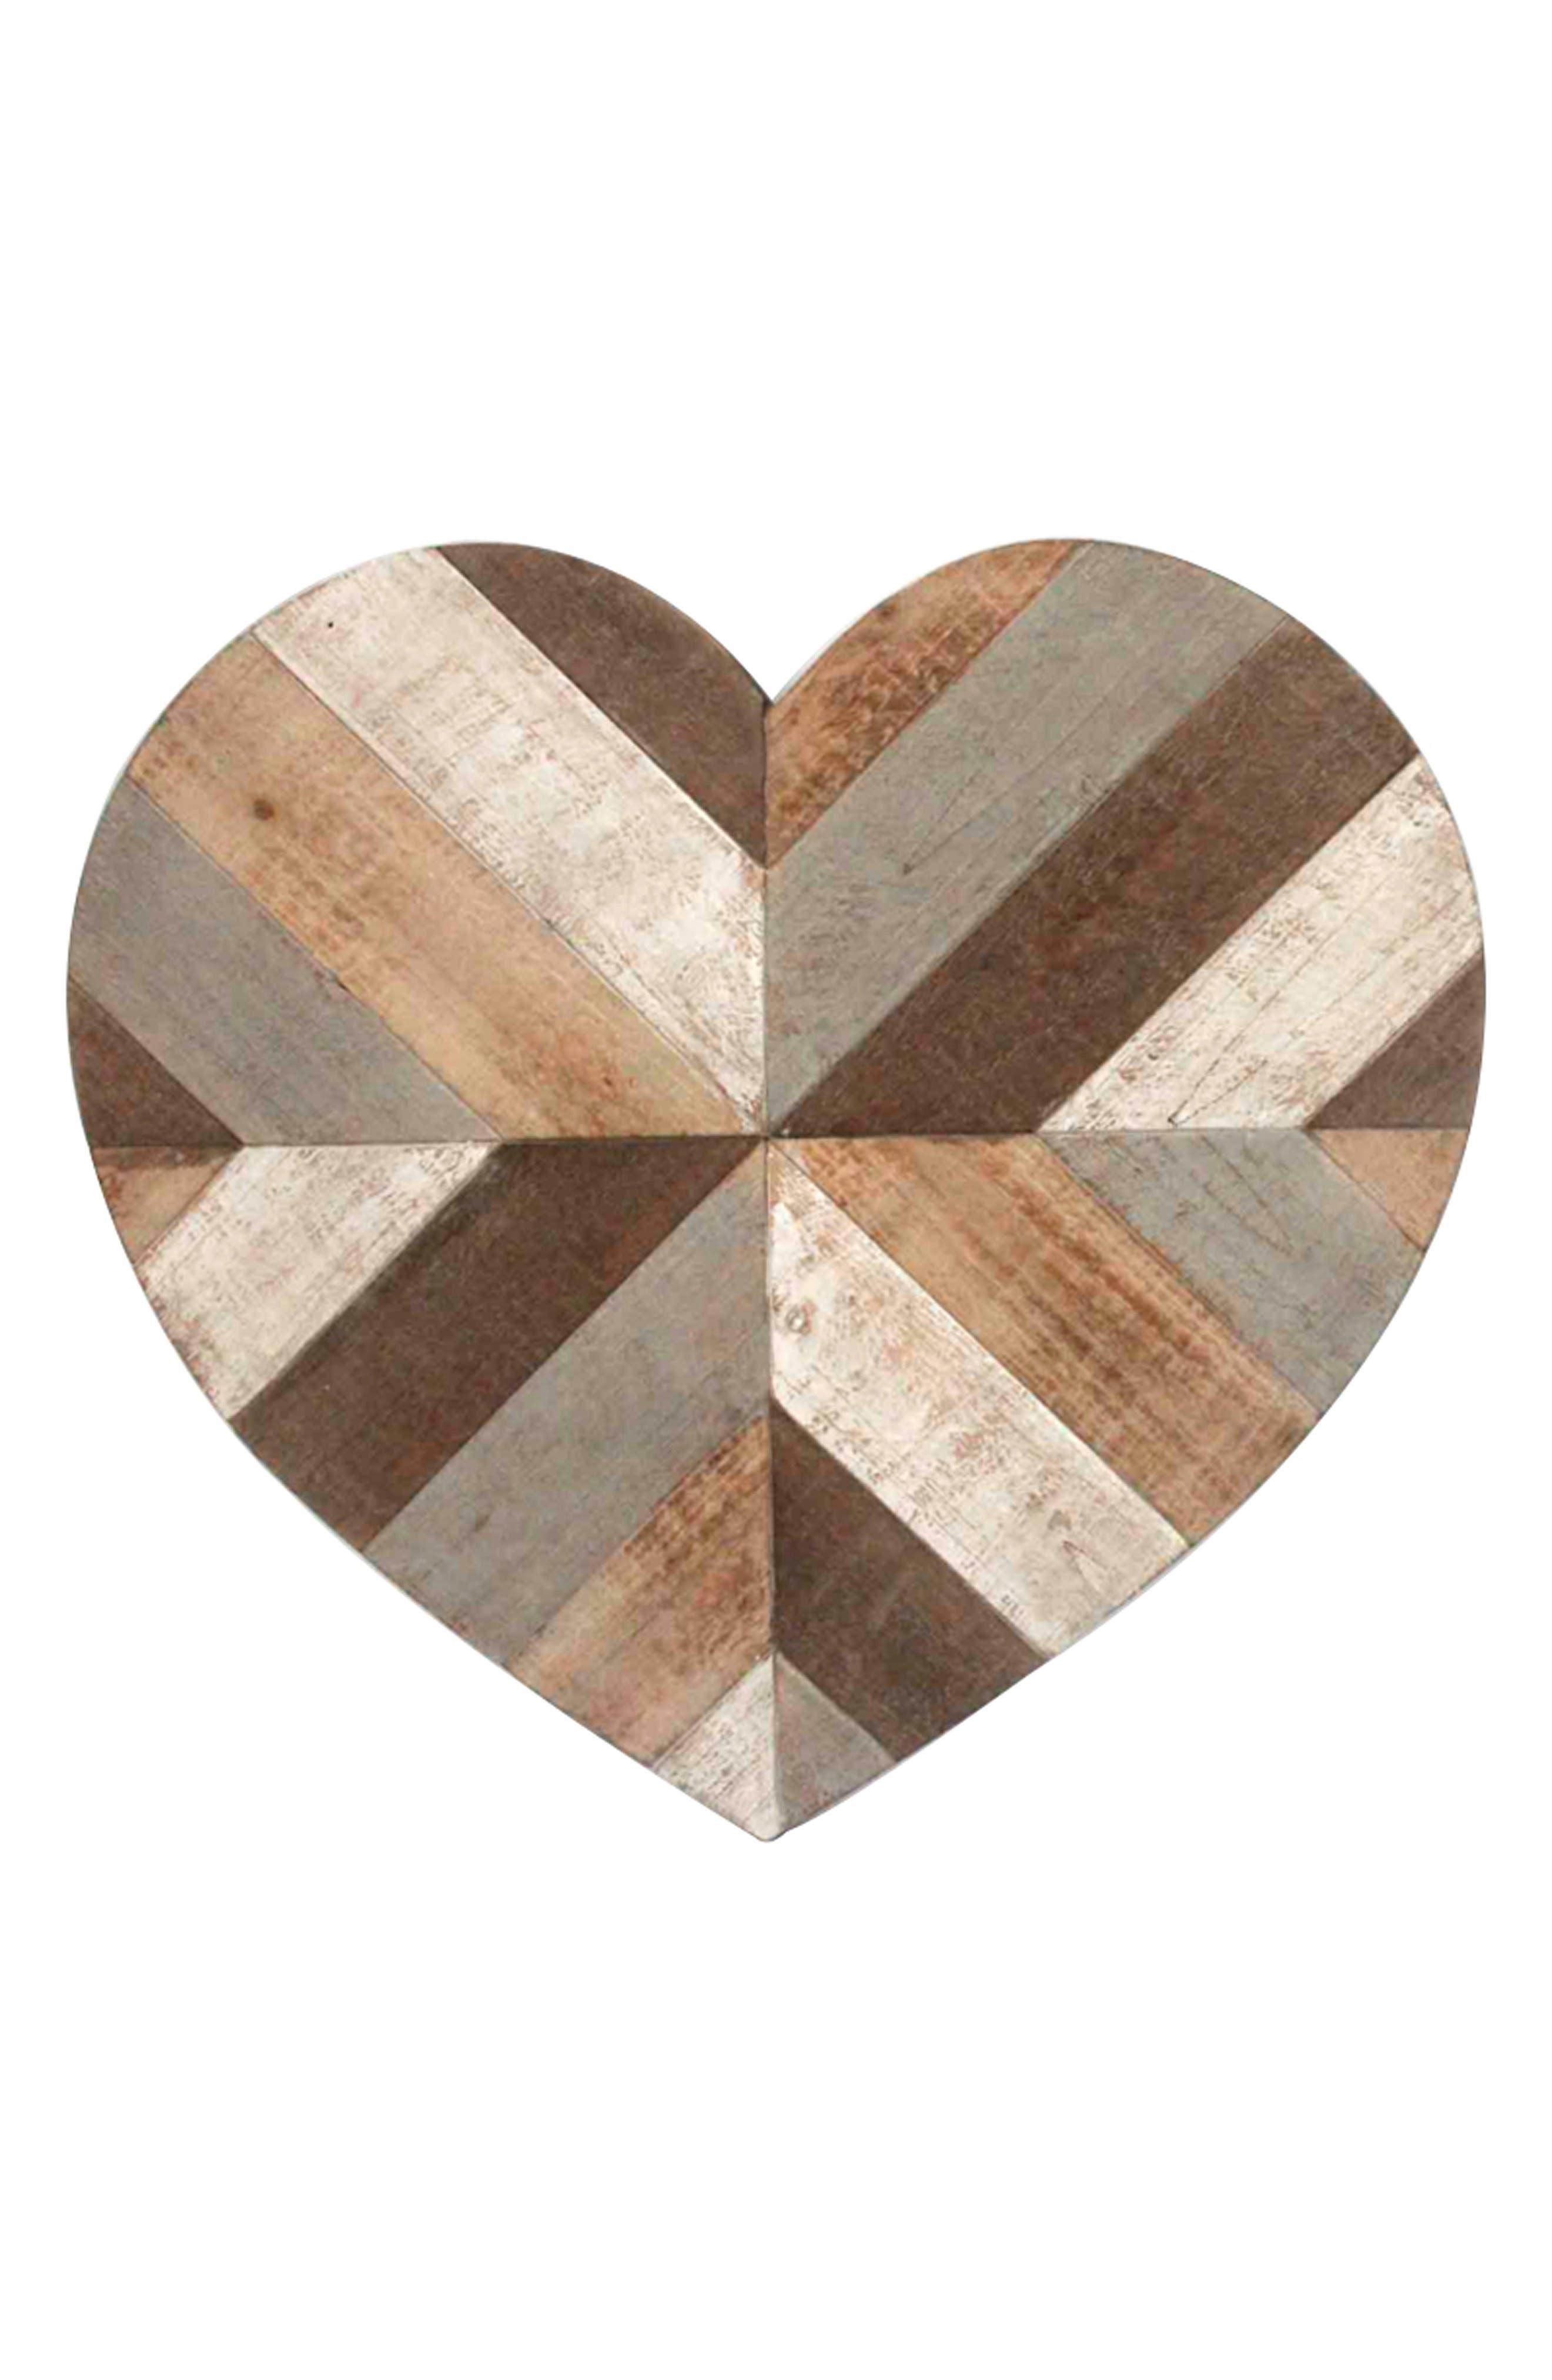 Alternate Image 2  - Crystal Art Gallery Wooden Heart Wall Art